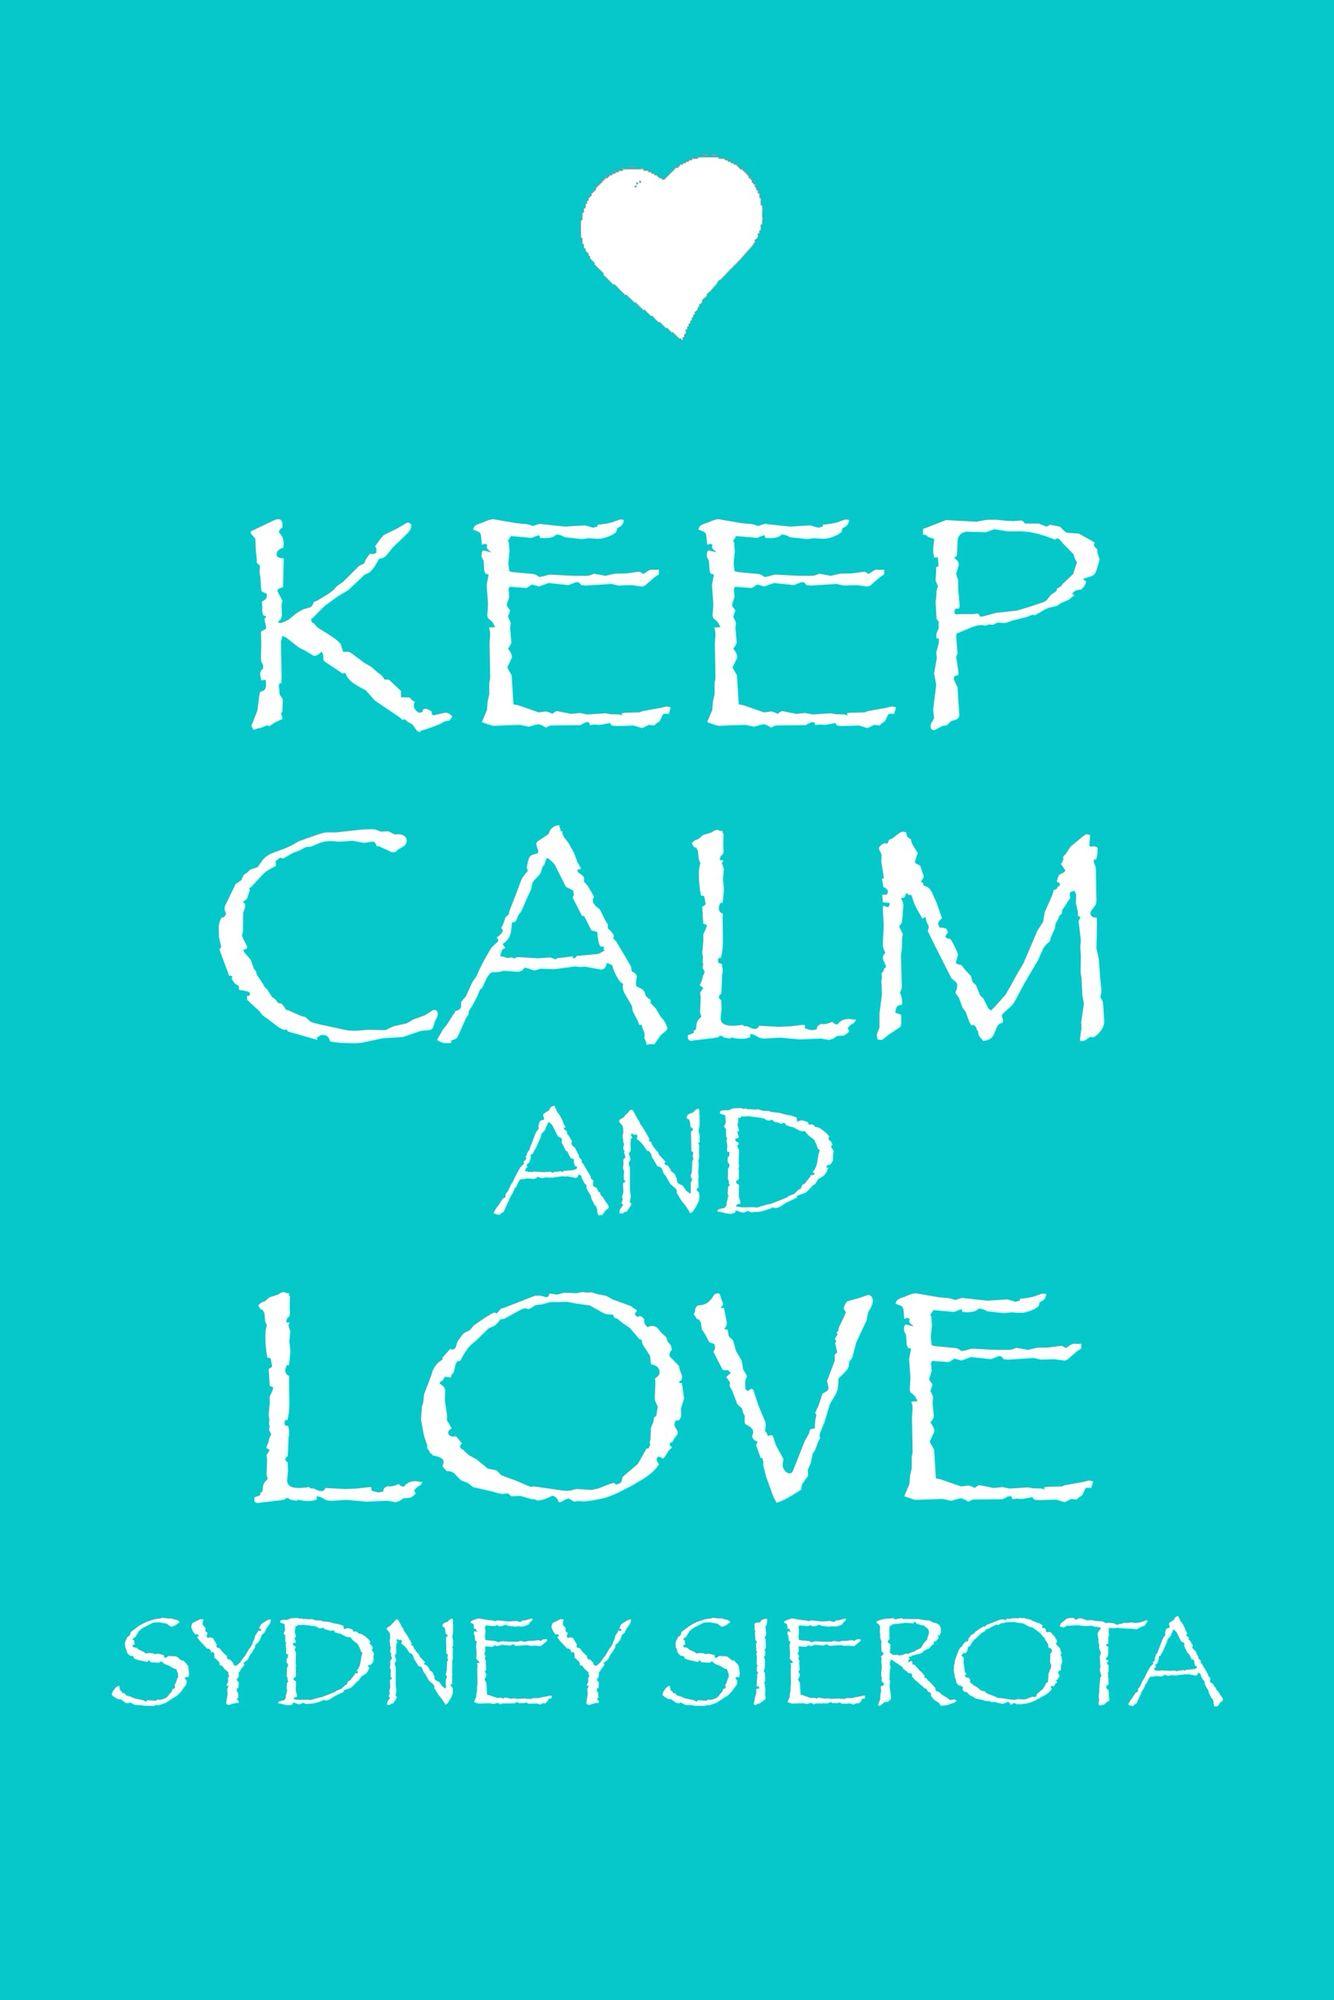 Sydney is my favorite singer